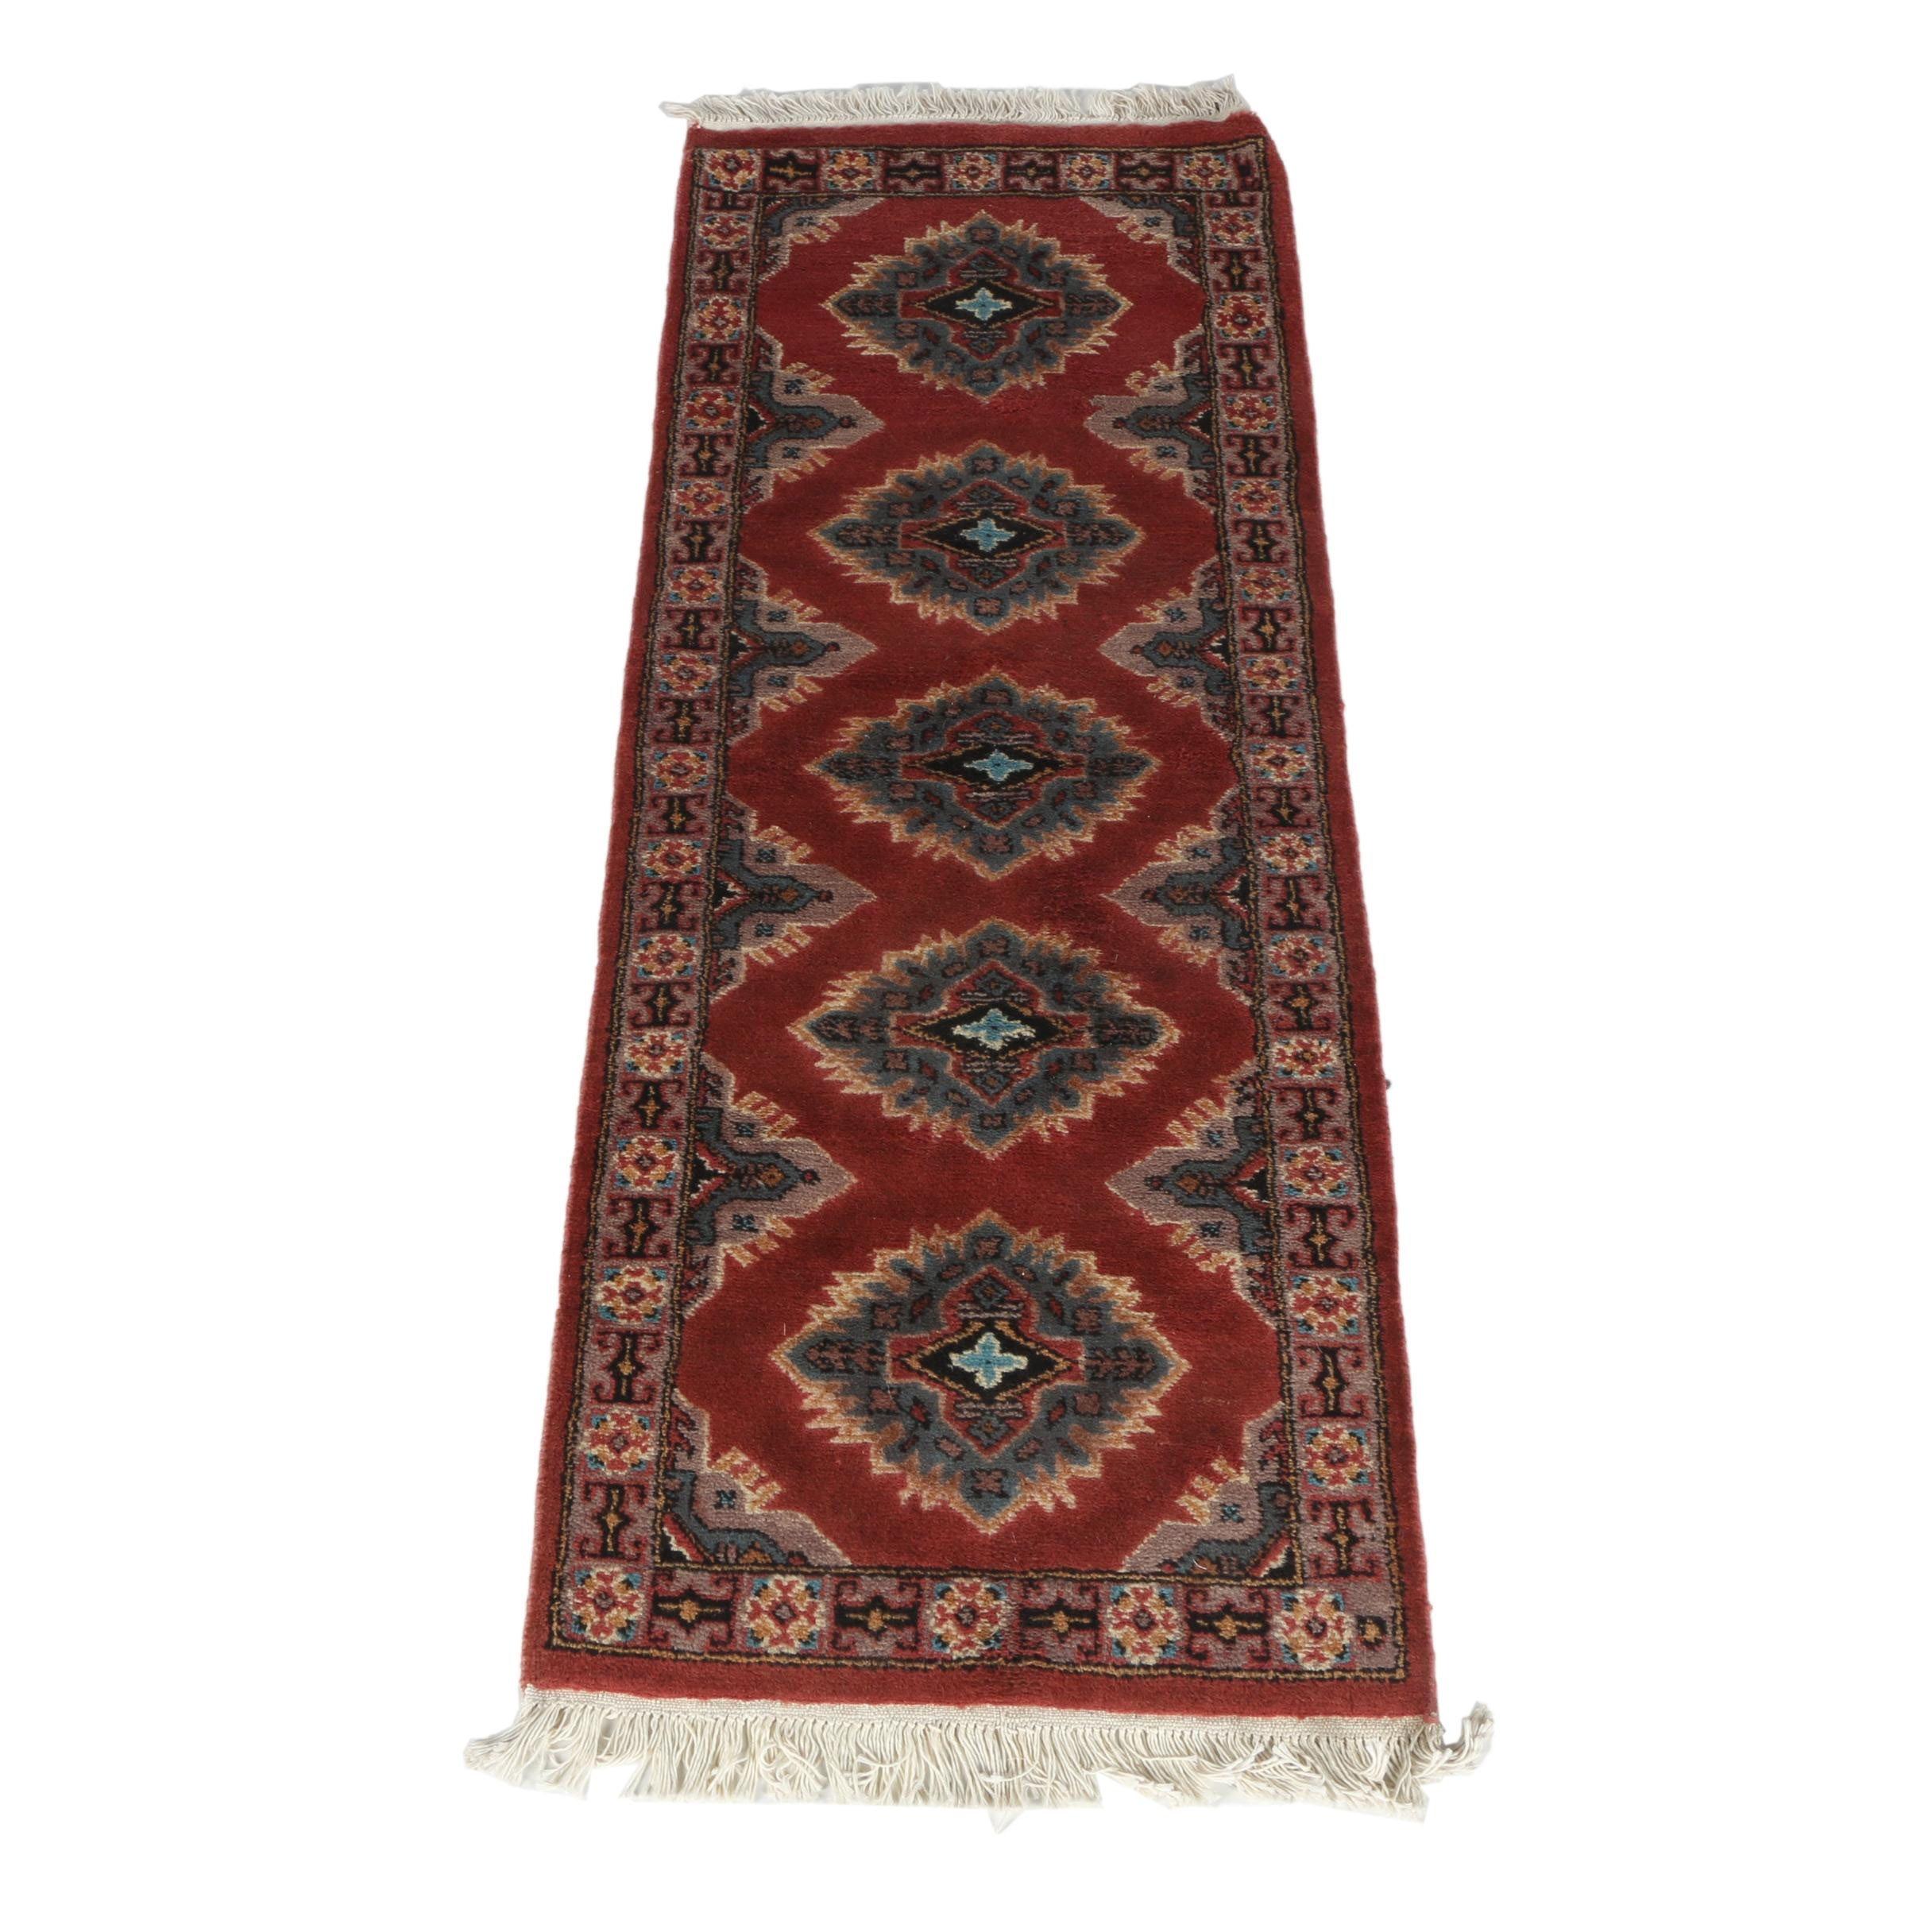 Hand-Knotted Pakistani Kazak Carpet Runner